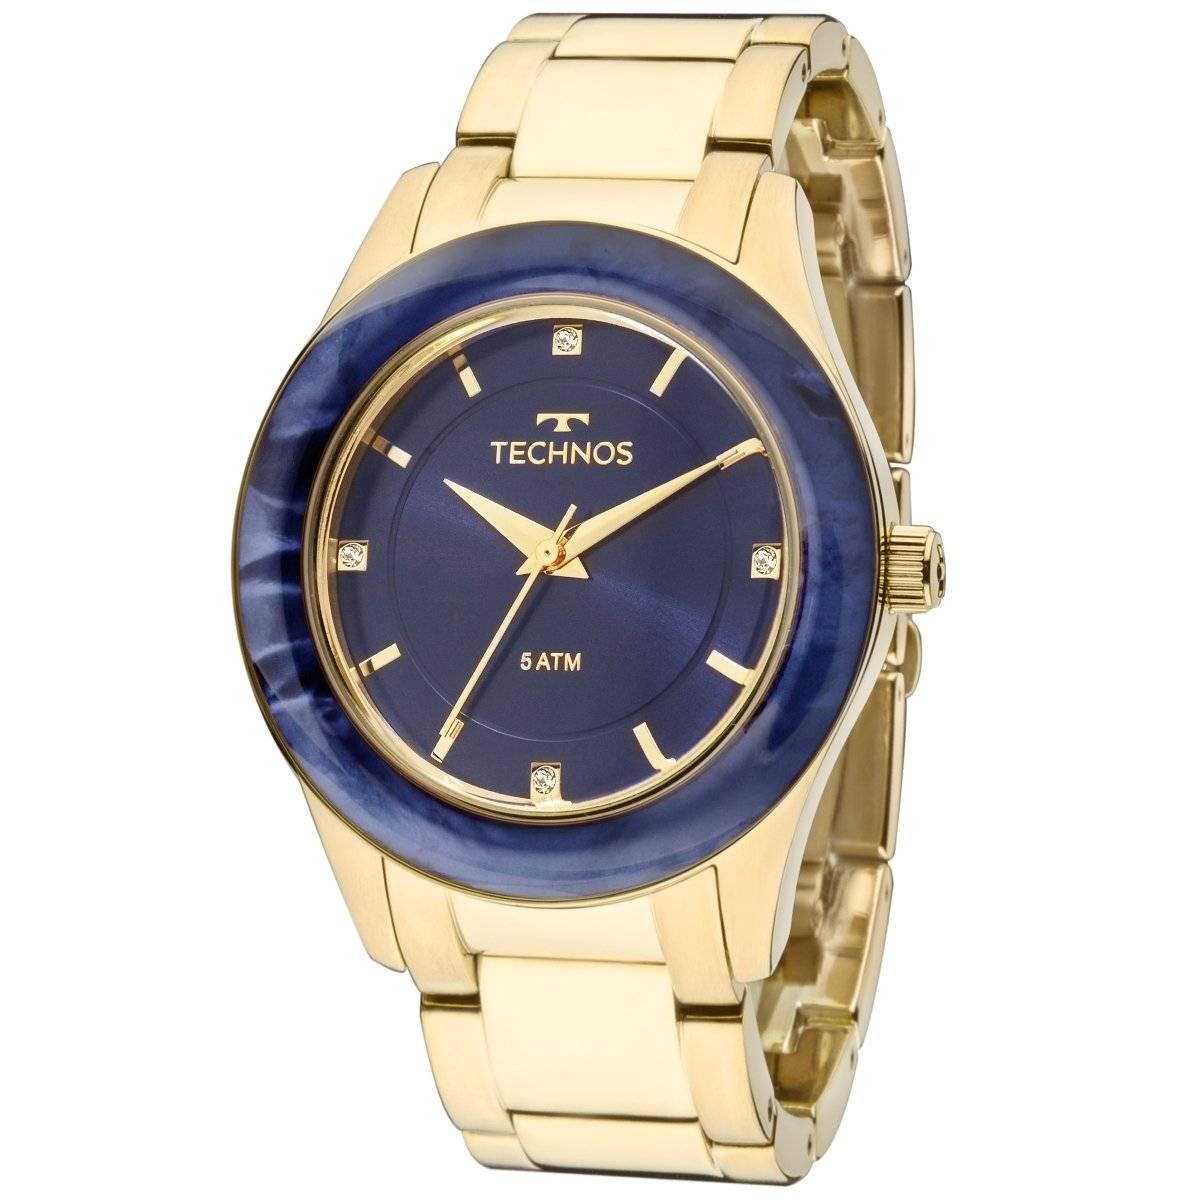 Relógio Technos Elegance ST. MORITZ Feminino Quartz 2036MGK/4A